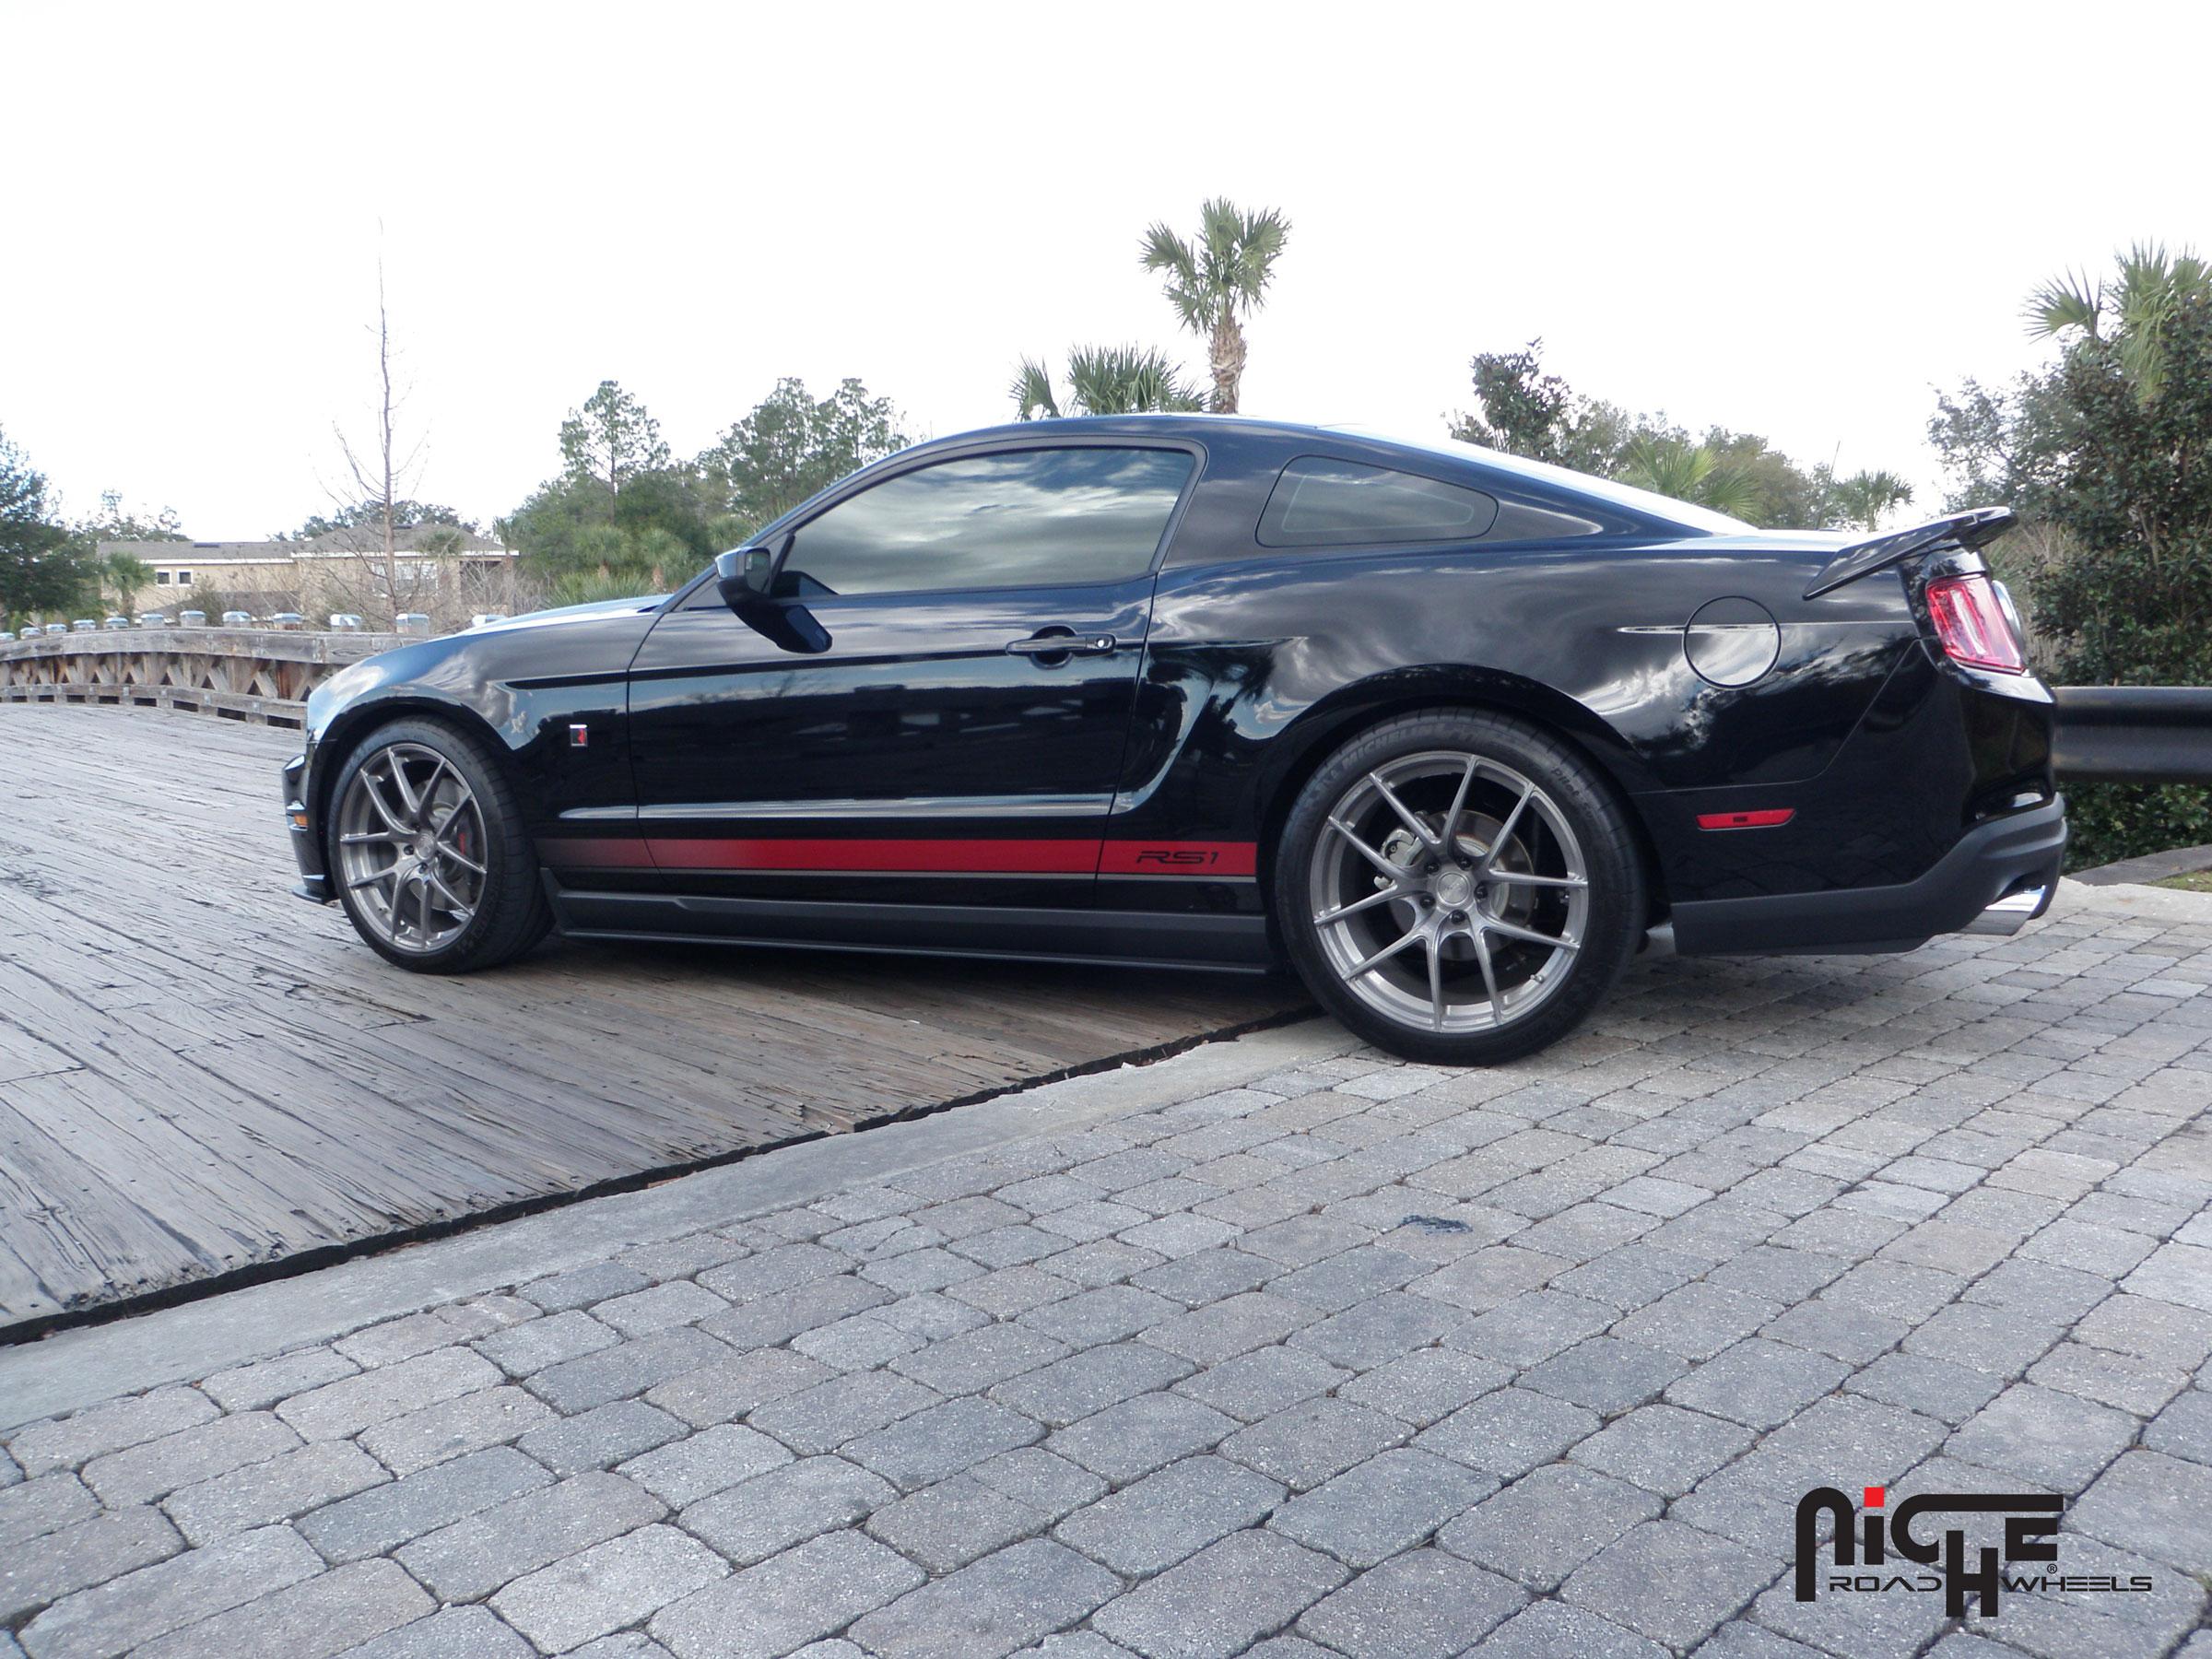 Ford Mustang Targa - M129 Gallery - MHT Wheels Inc.